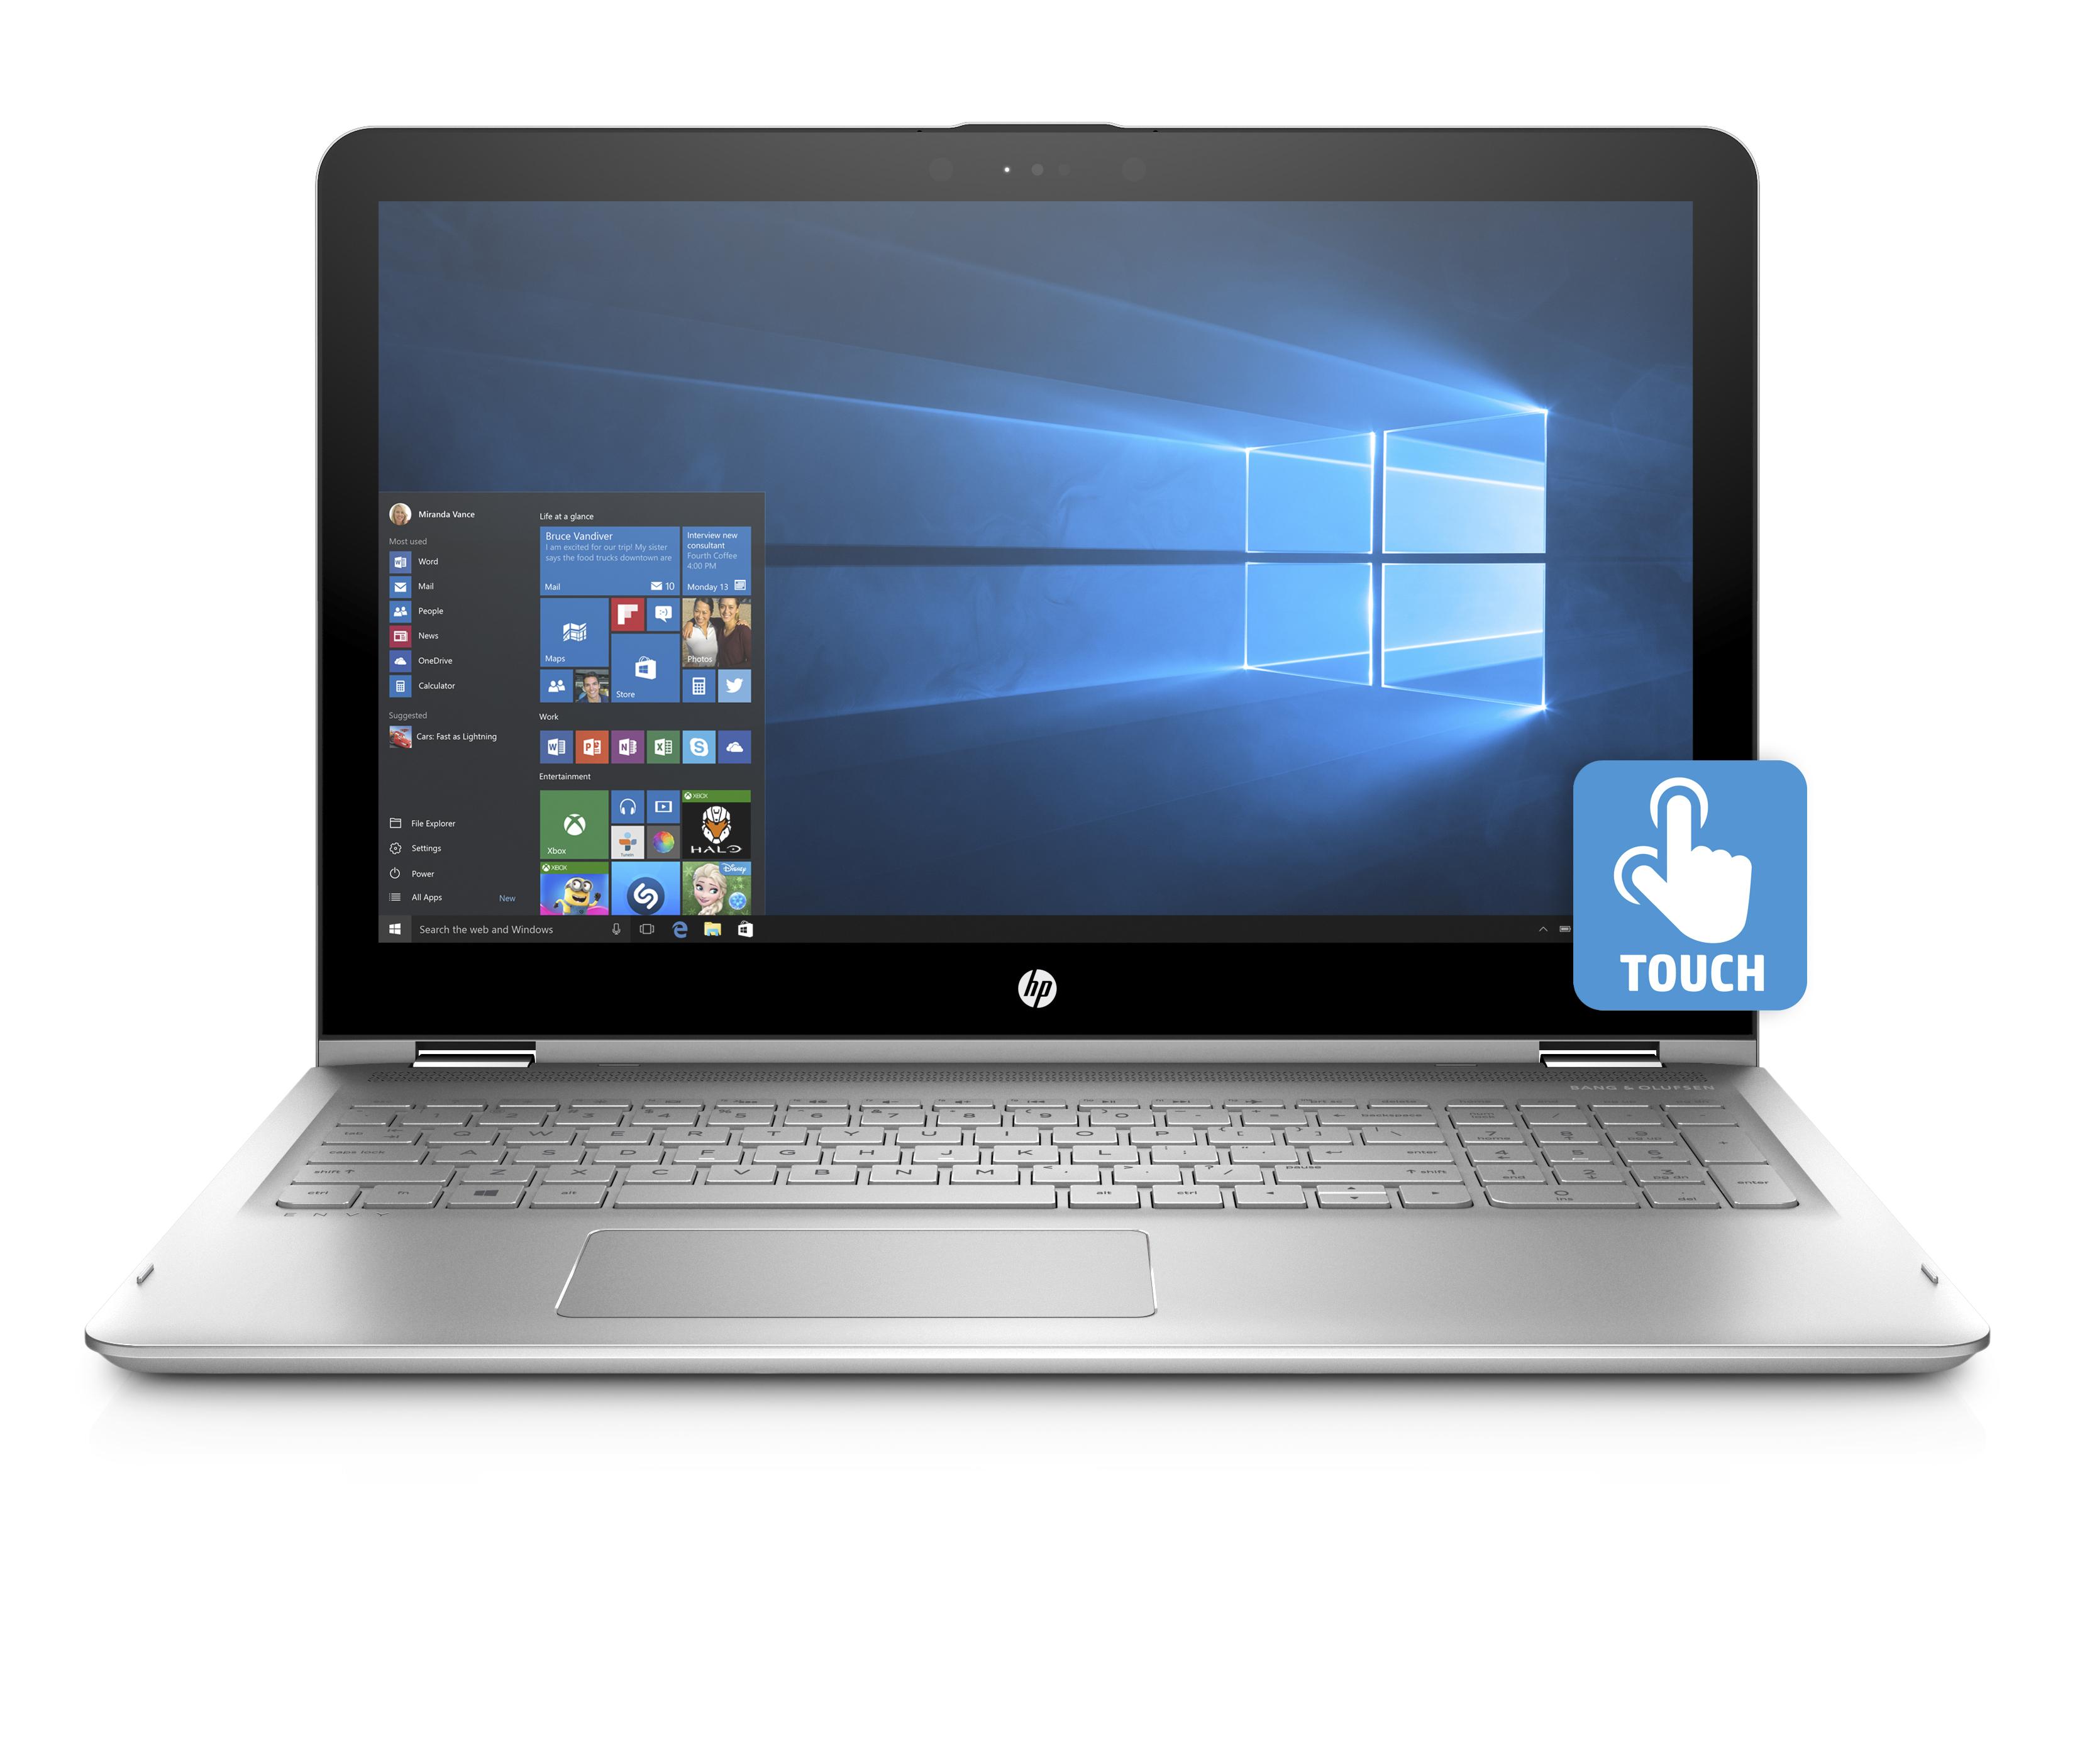 W6Y72EA#BCM HP Envy x360 15-aq004nc FHD i7-6560U/8GB/1TB+128SSD/2RServis/W10-silver